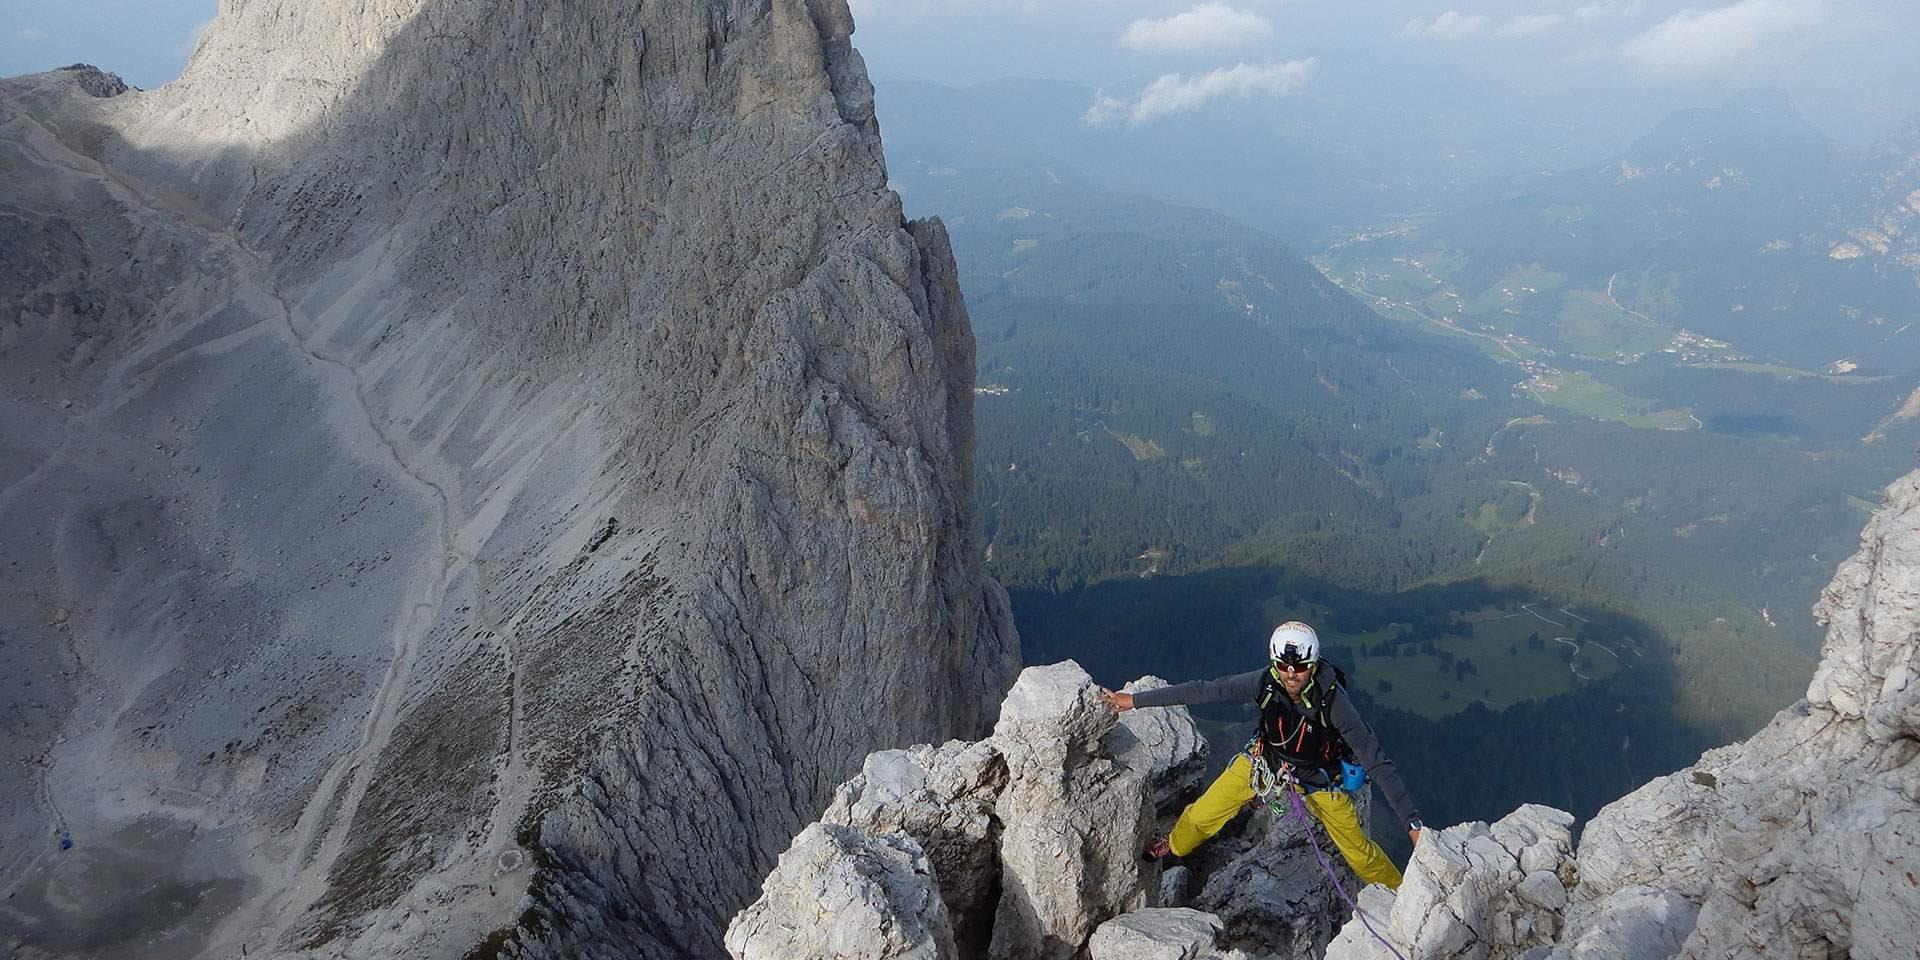 Weekly basic rock climbing course